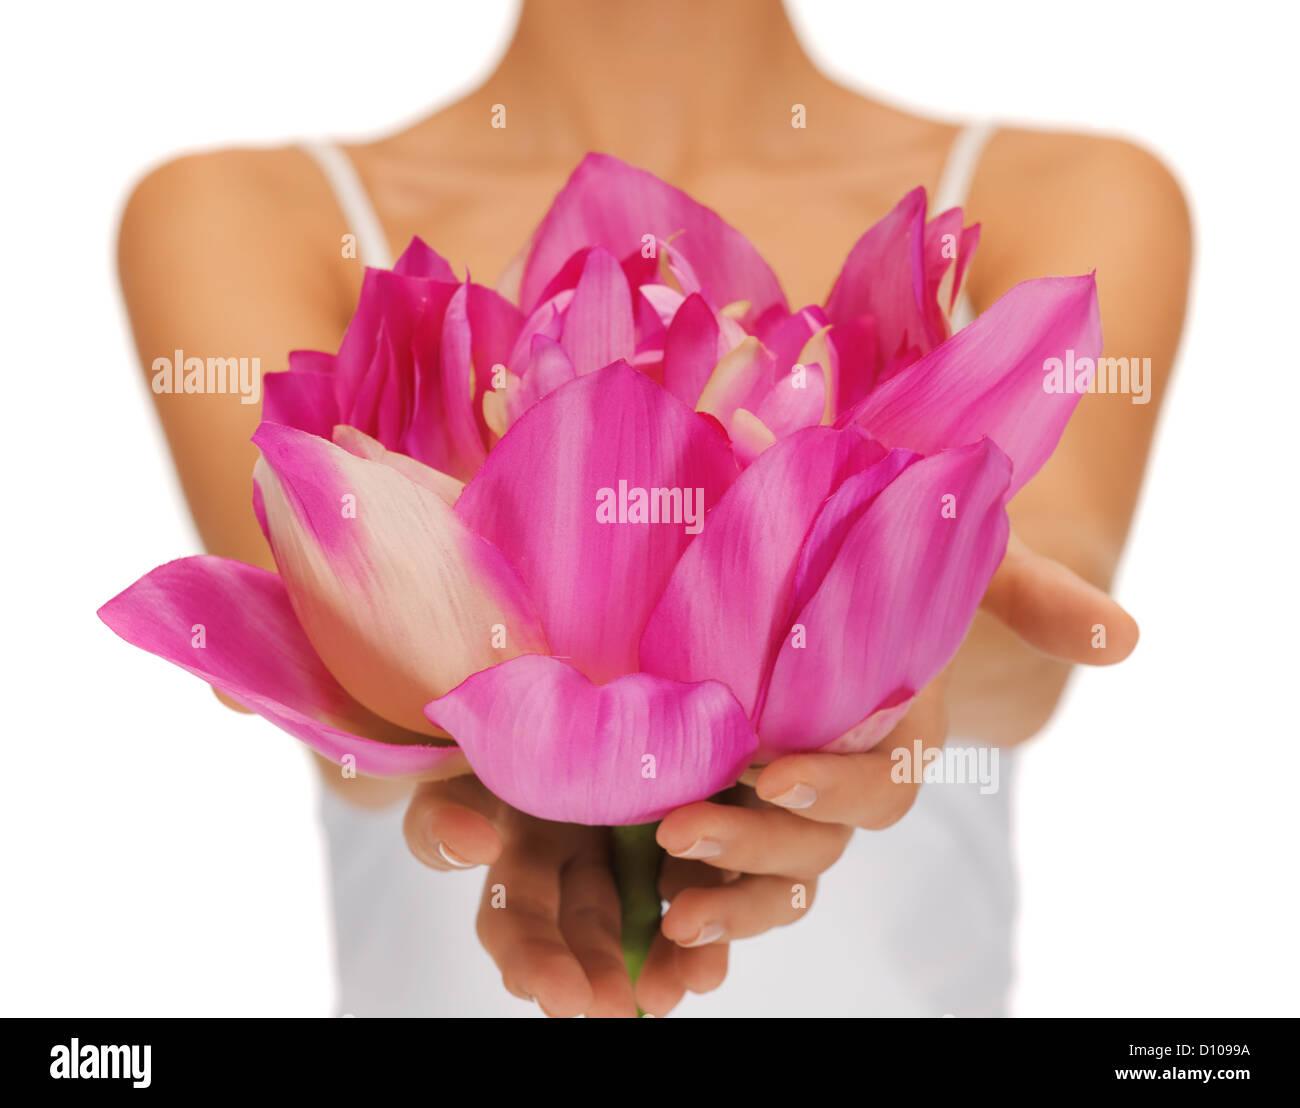 Hands holding lotus flower stock photos hands holding lotus flower woman hands holding lotus flower stock image mightylinksfo